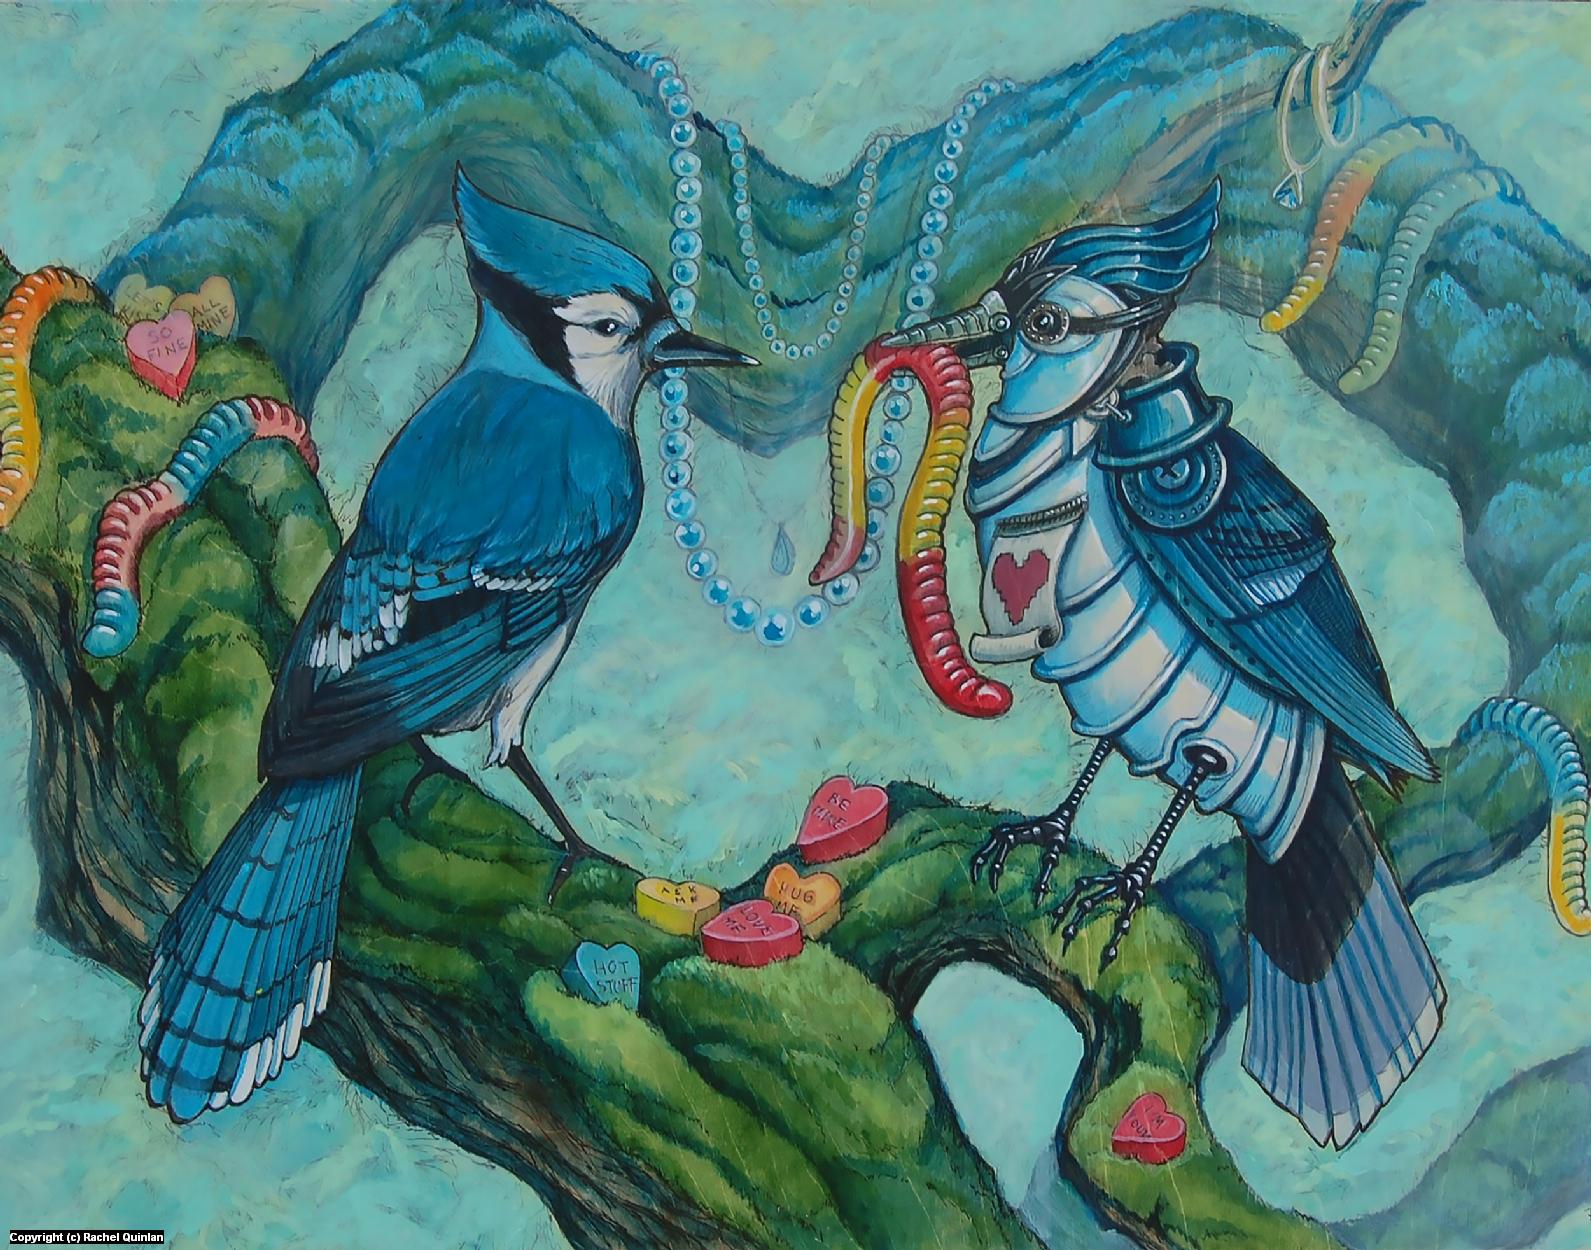 The Offering Artwork by Rachel Quinlan